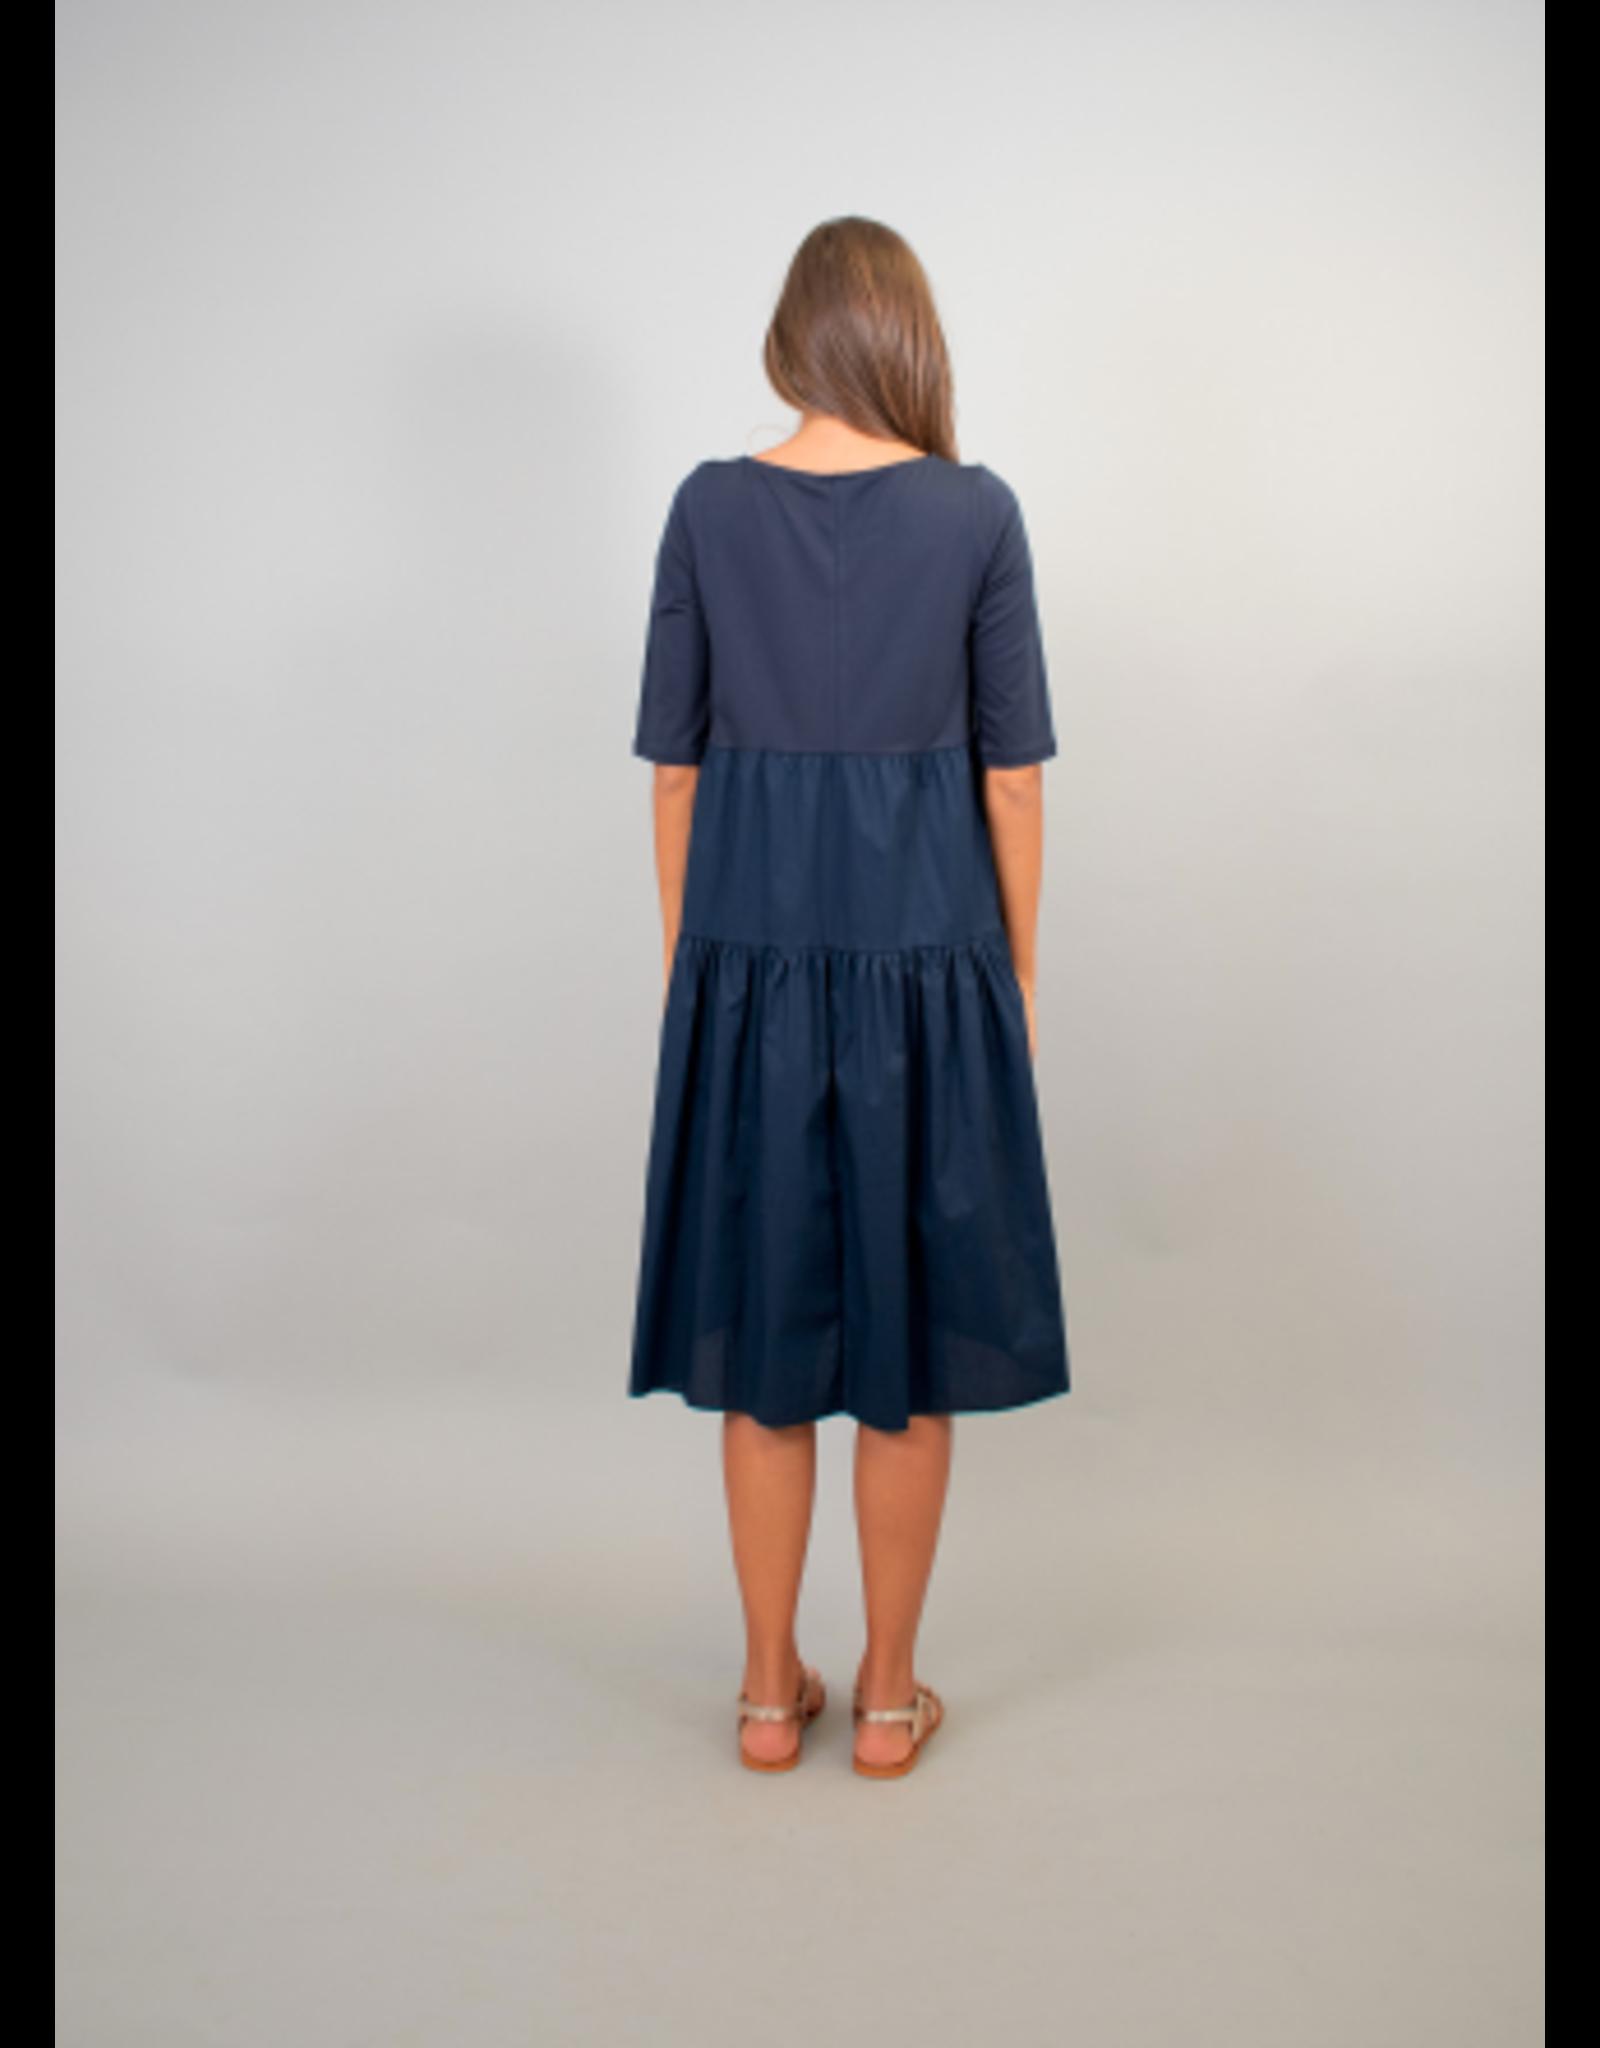 Humility Flavia Dress